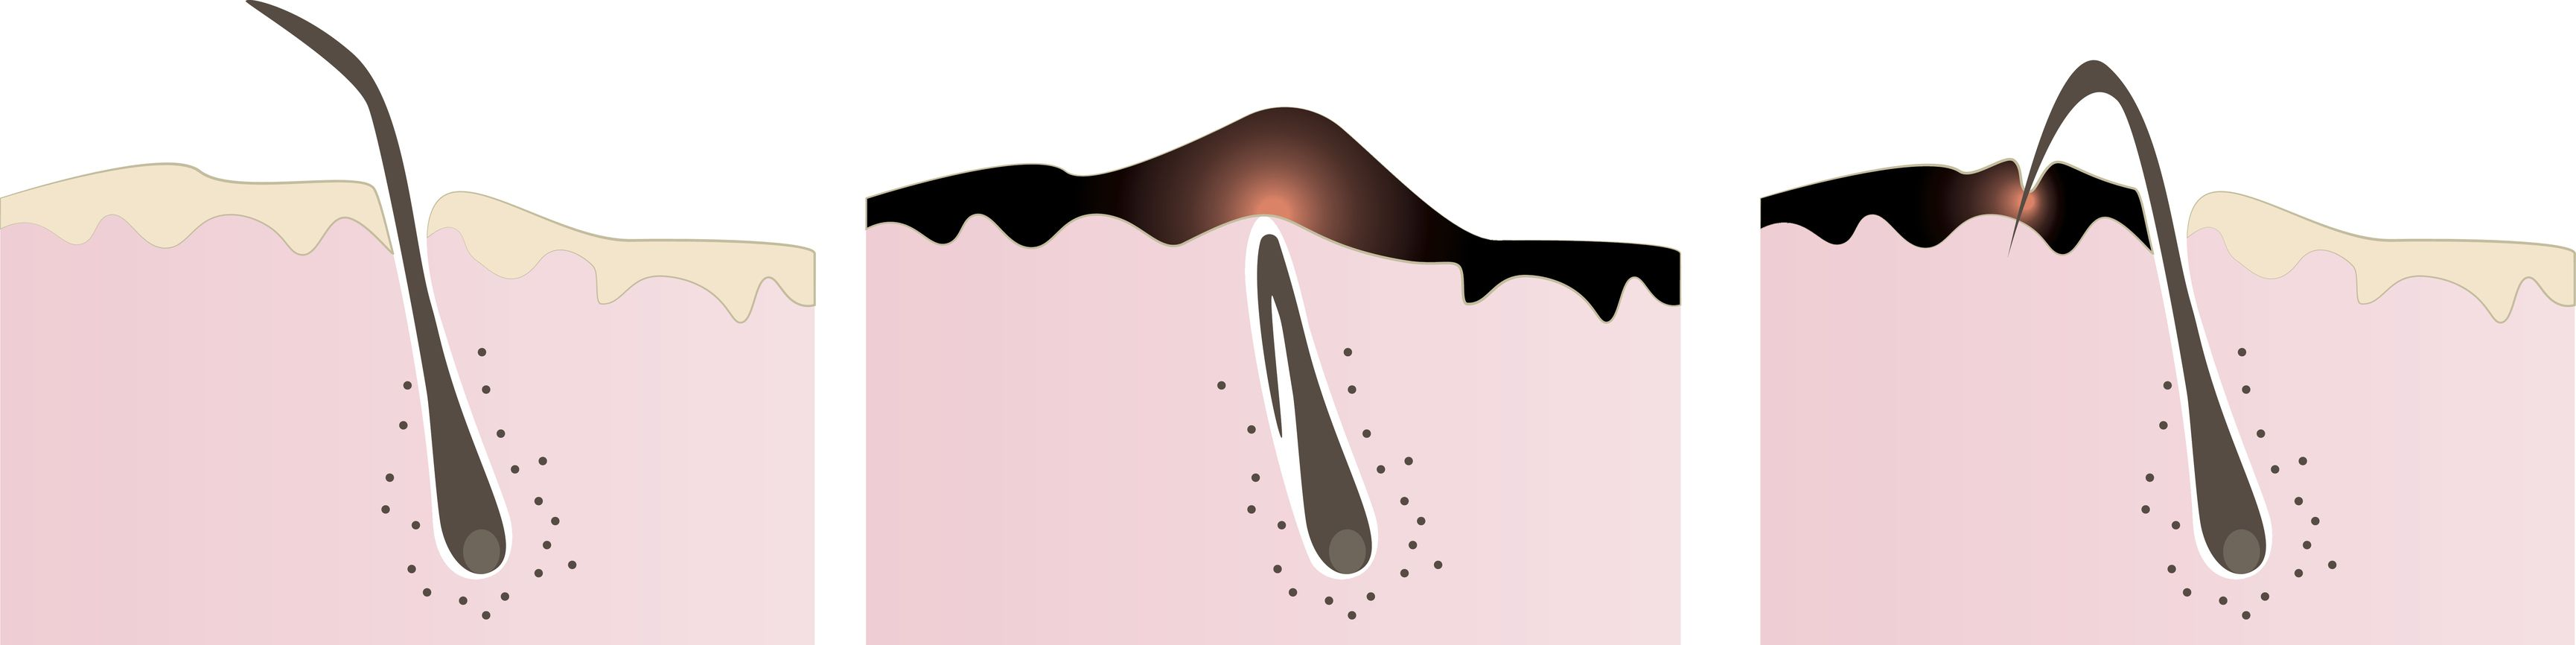 ingrown pubic hair when shaving